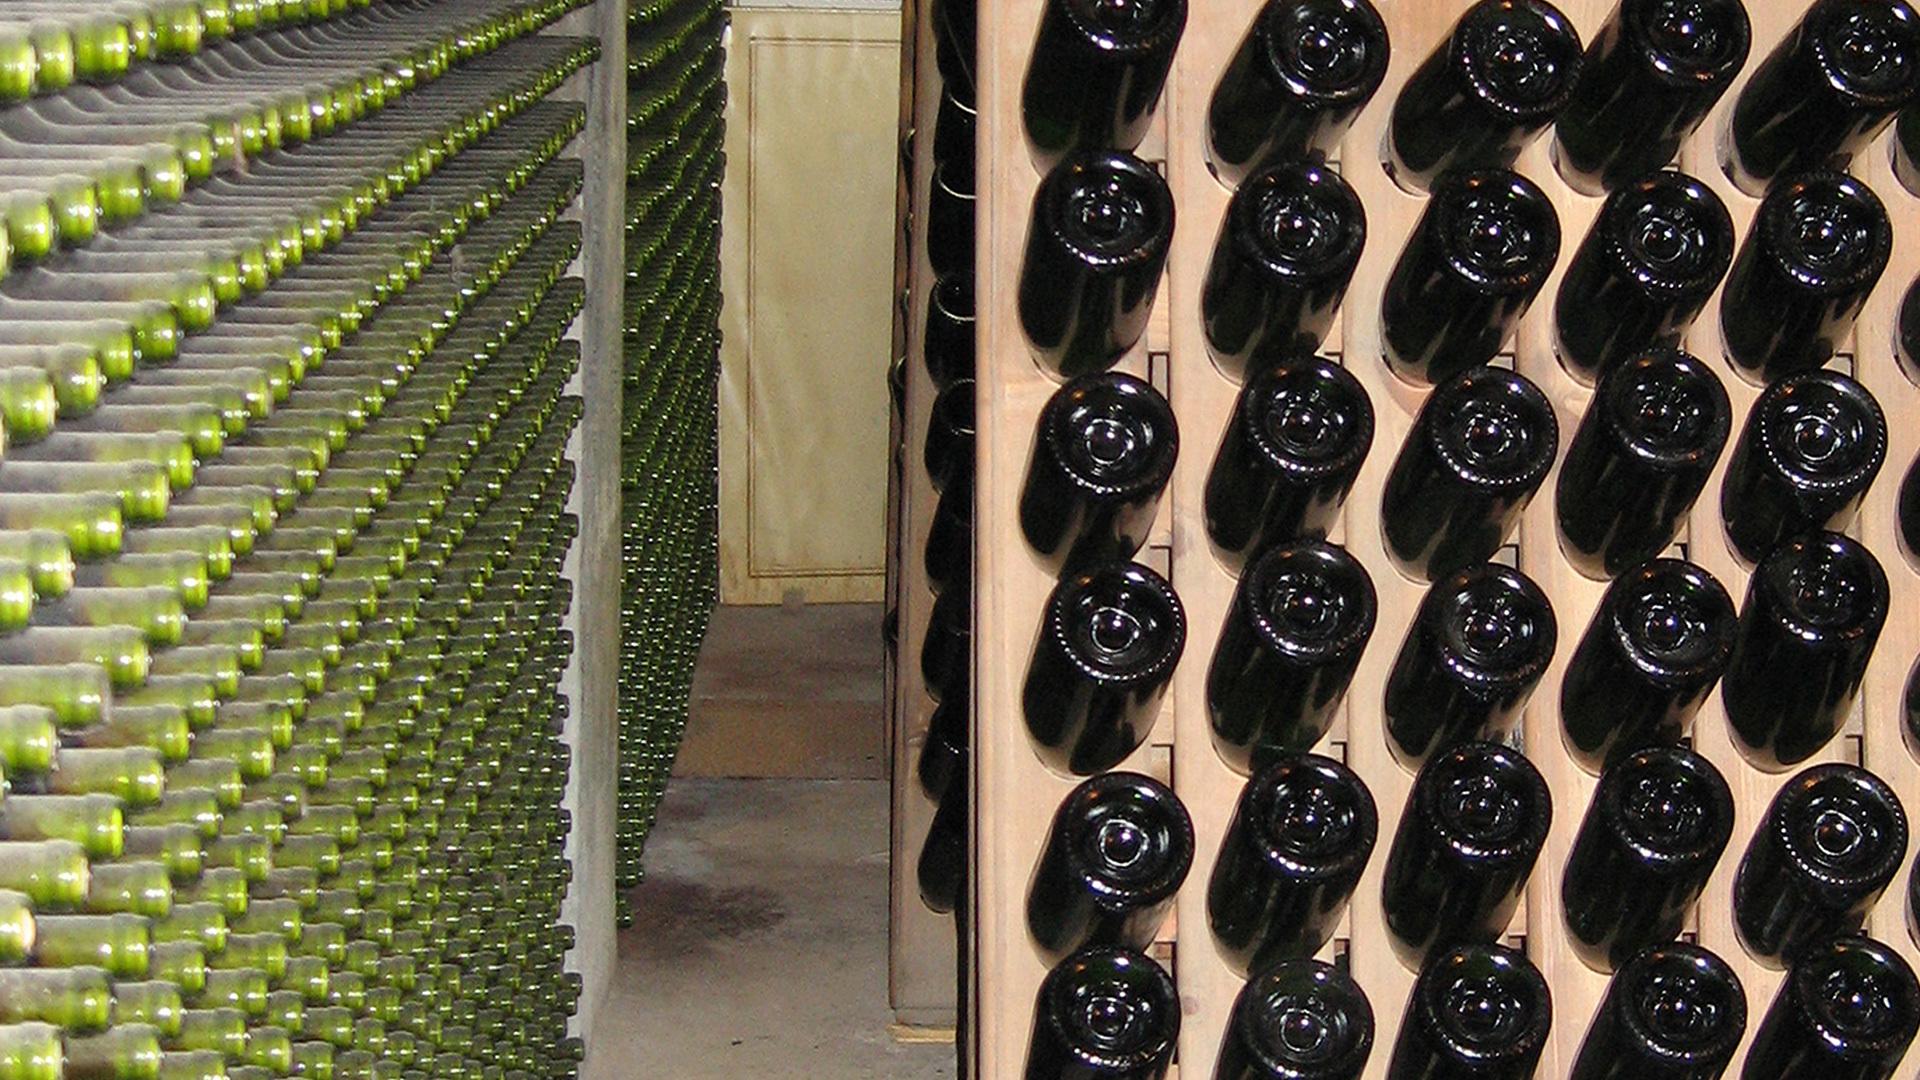 Pere Seda wine bottles mallorca